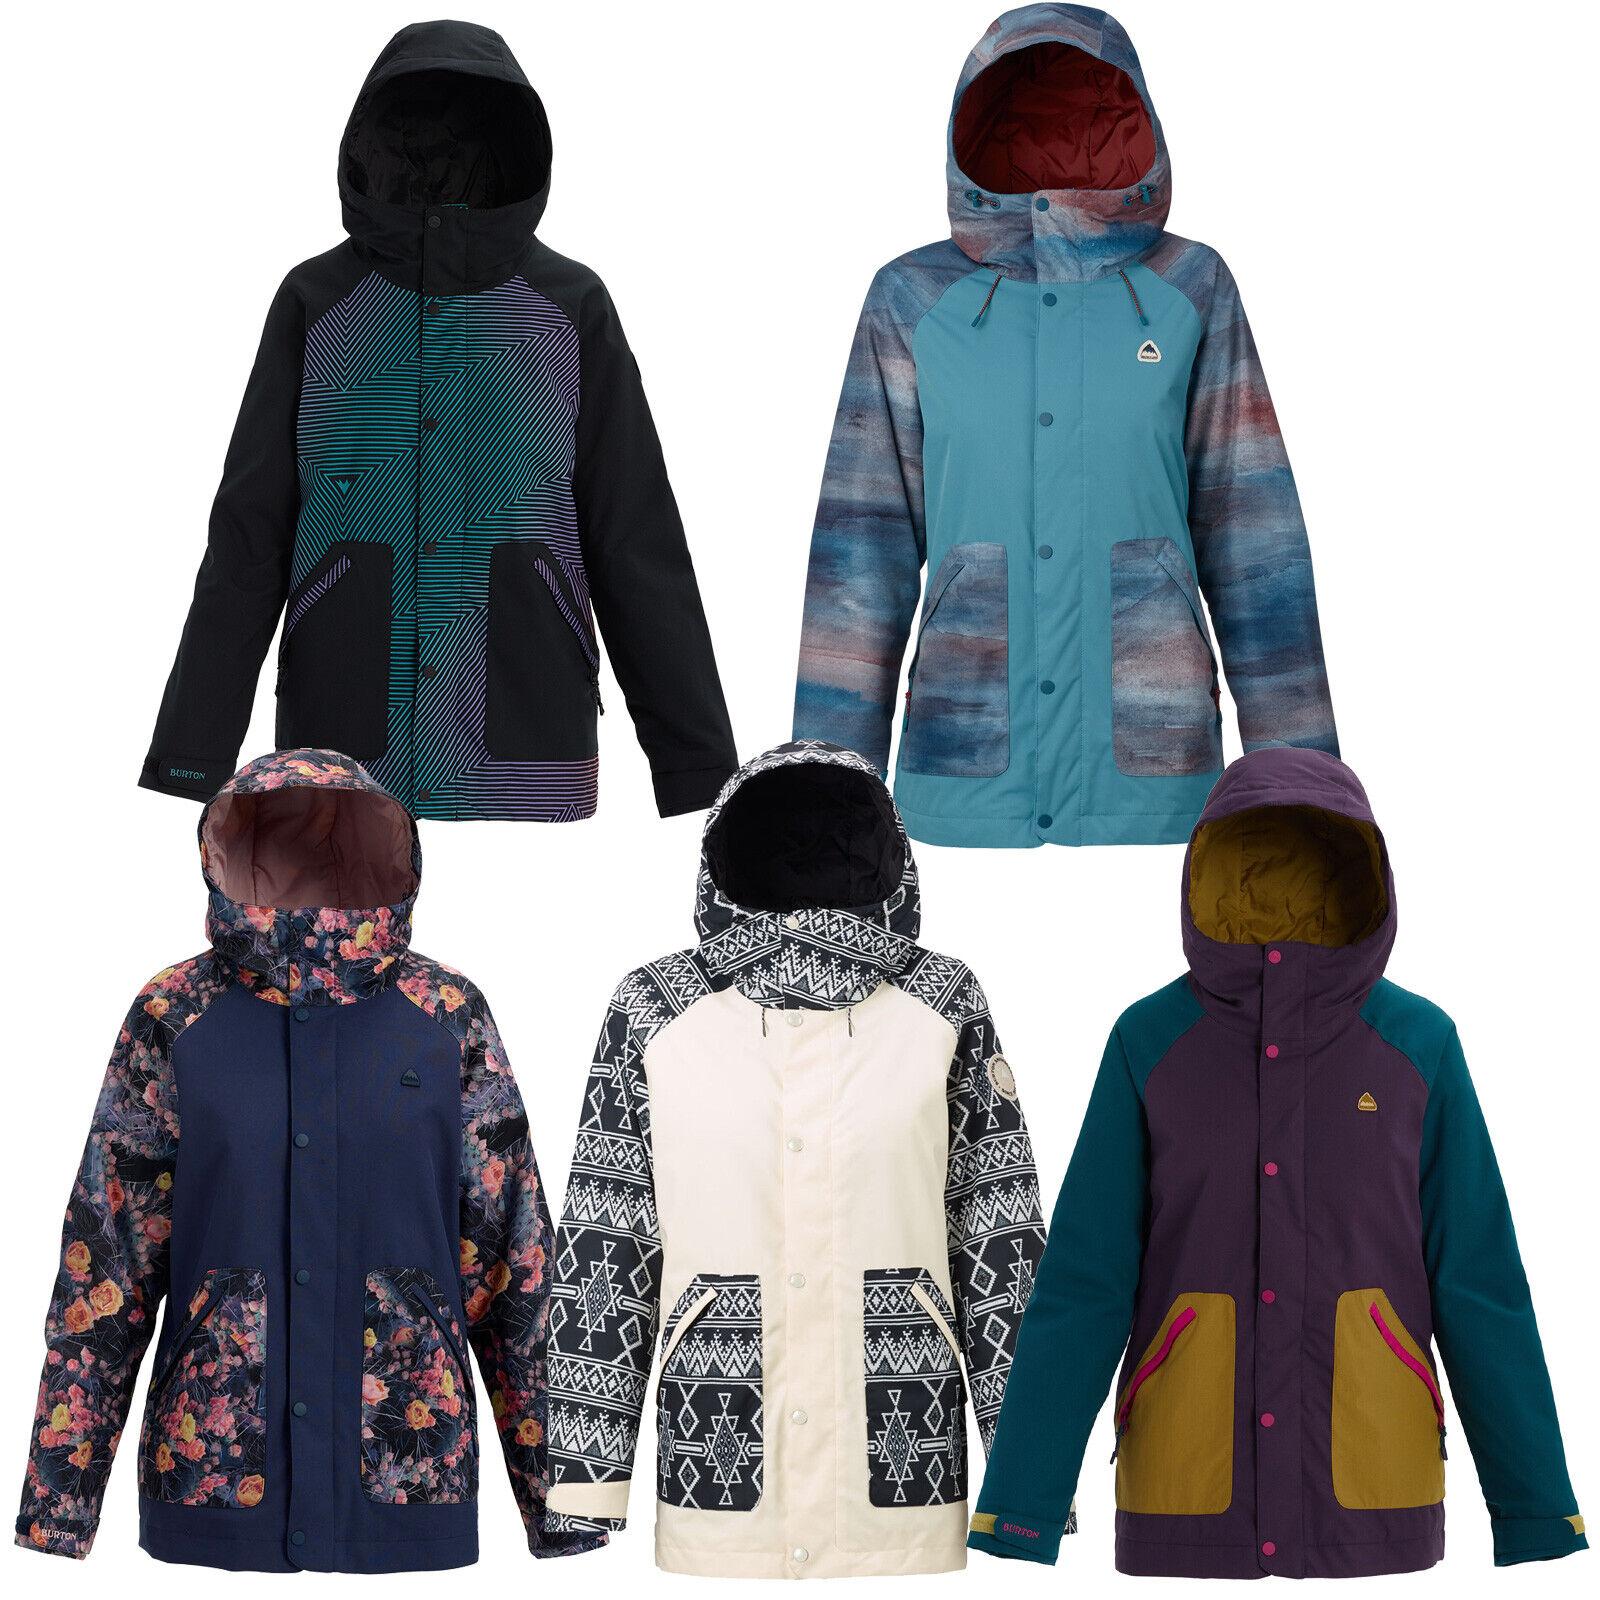 Burton Jaded Sedona Larkspur Eastfall Womens Snowboarding Jacket M For Sale Online Ebay